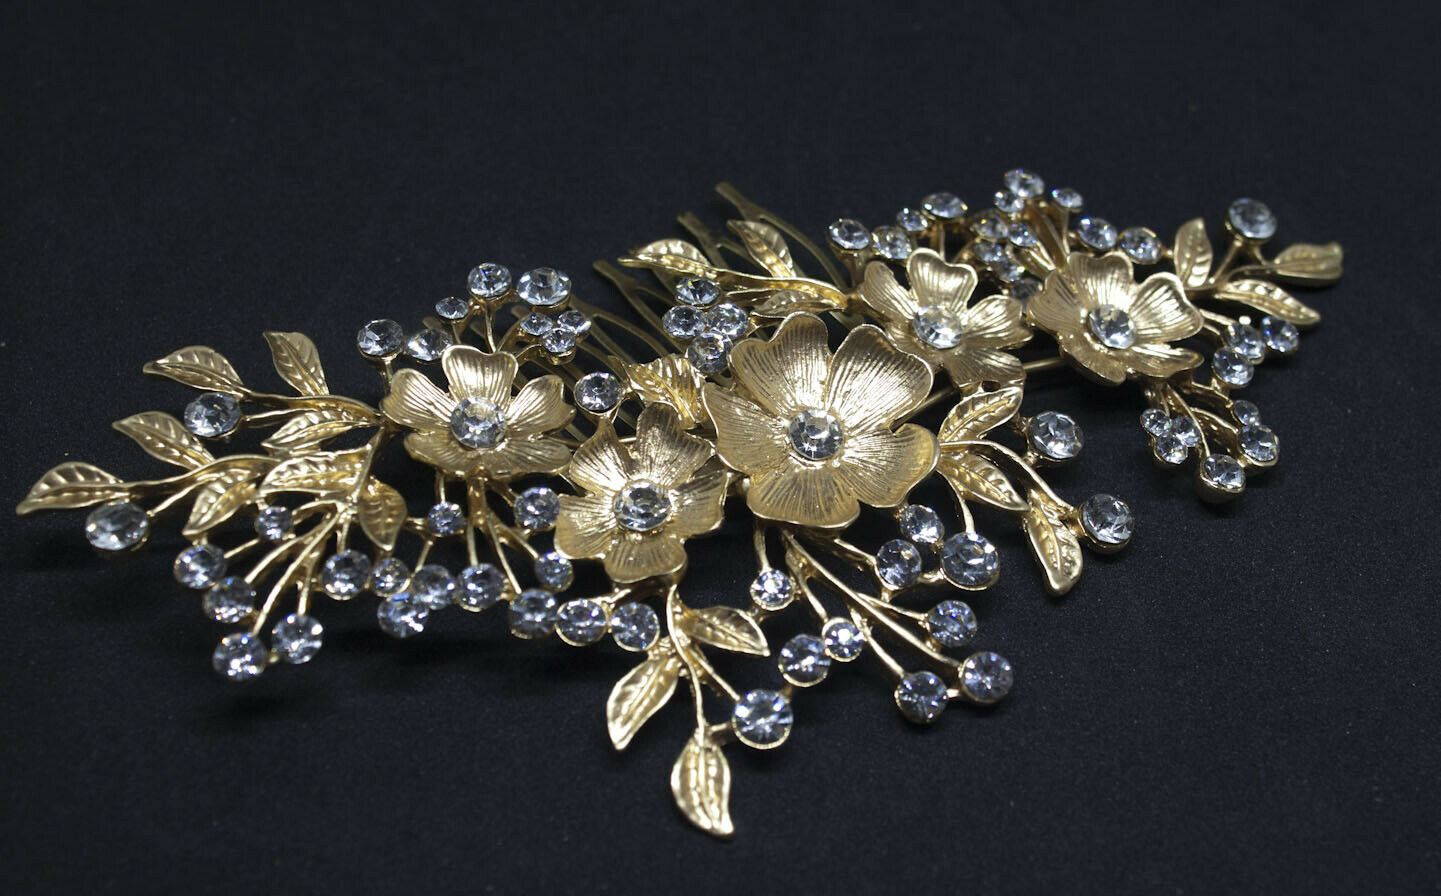 Gold tone hair comb bridal wedding crystal rhinestone hair accessories ha1925